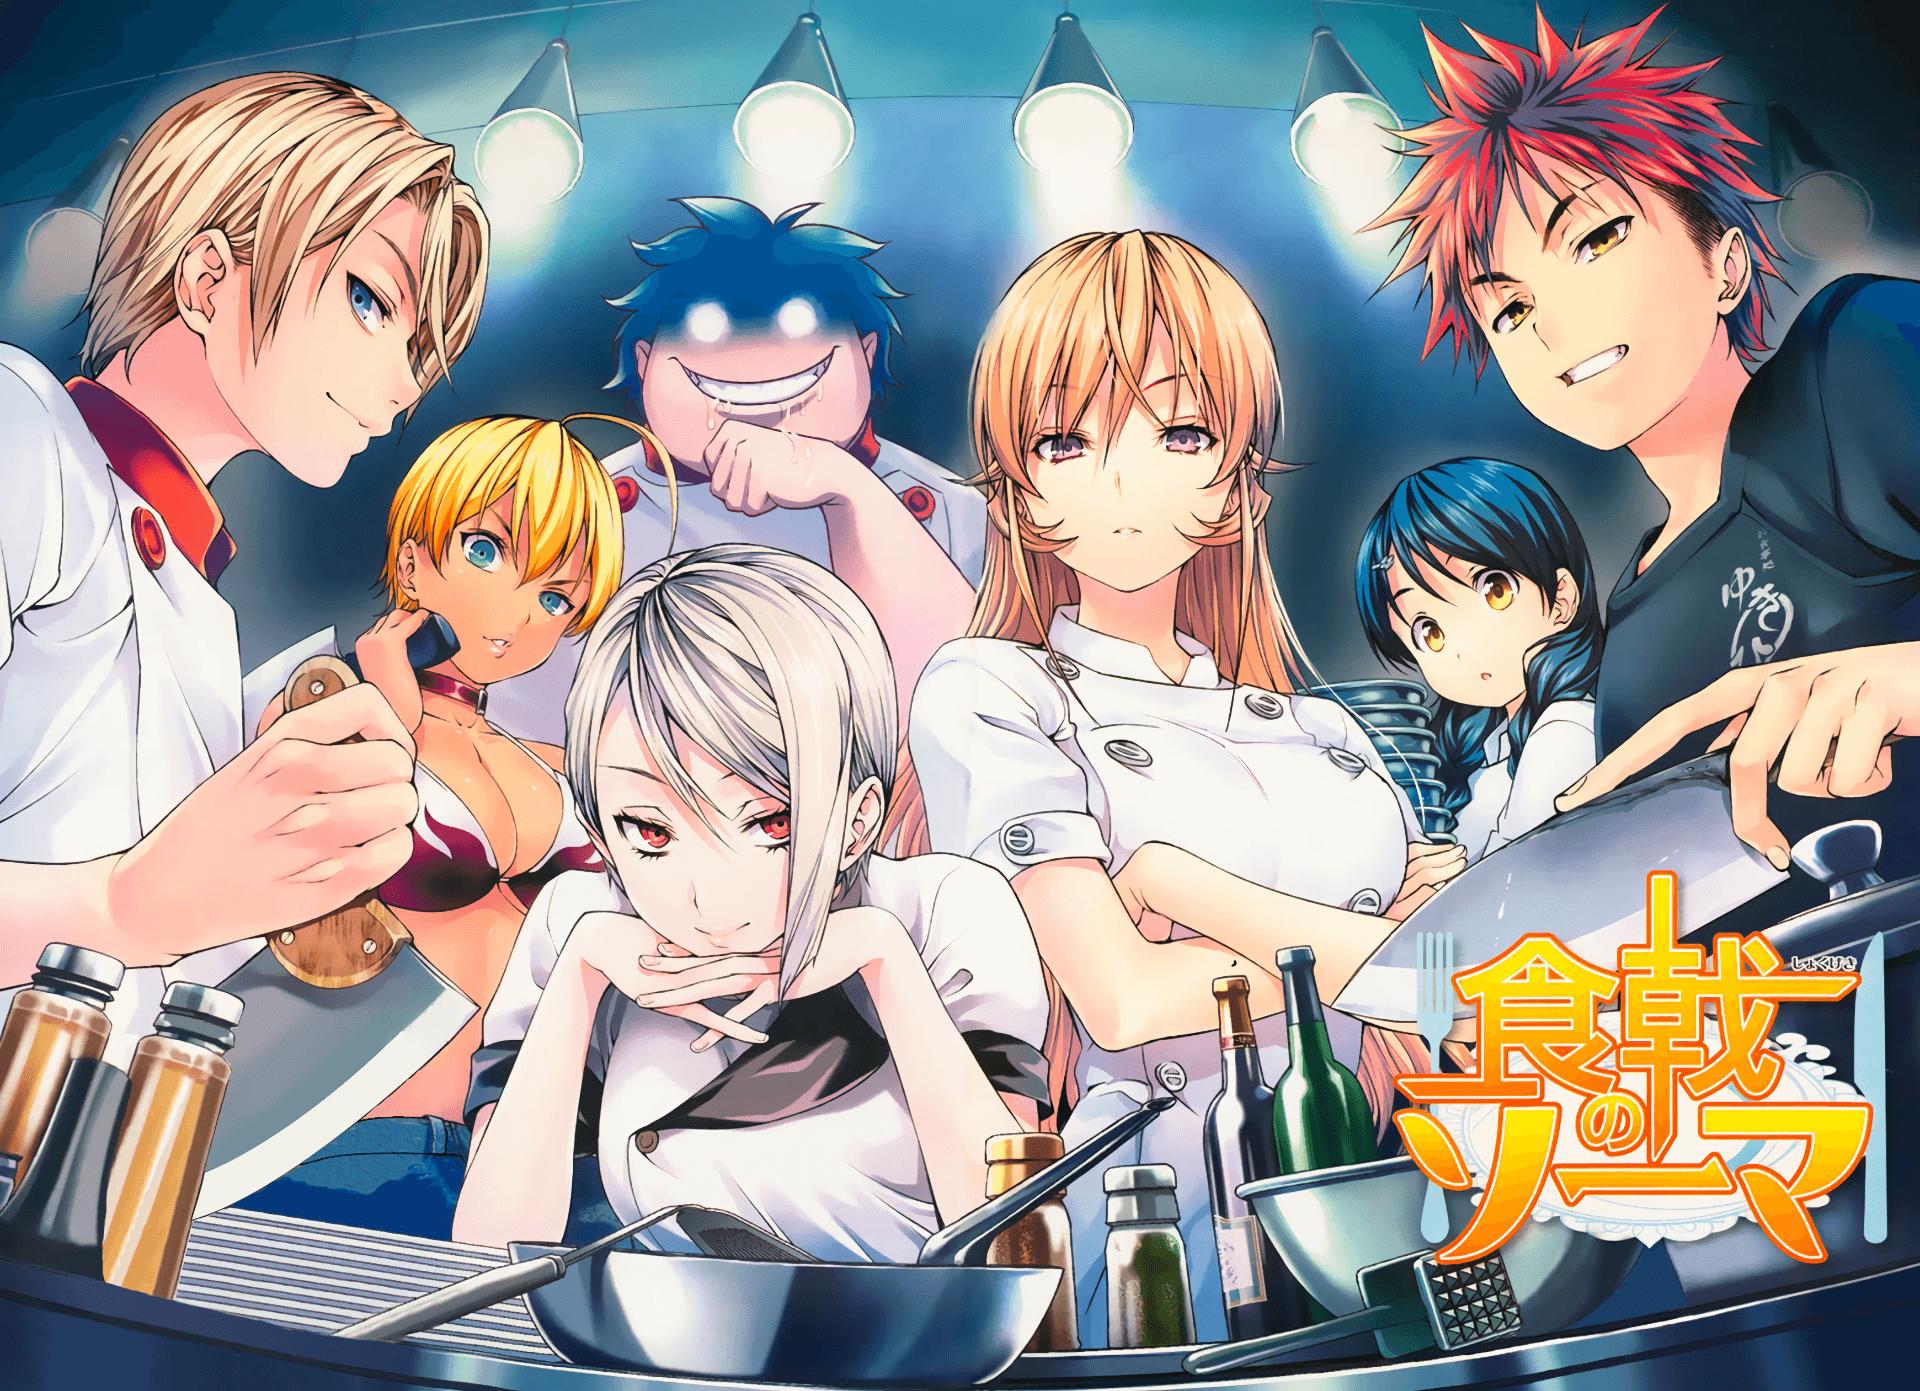 Food Wars Anime Wallpapers - Top Free Food Wars Anime ...